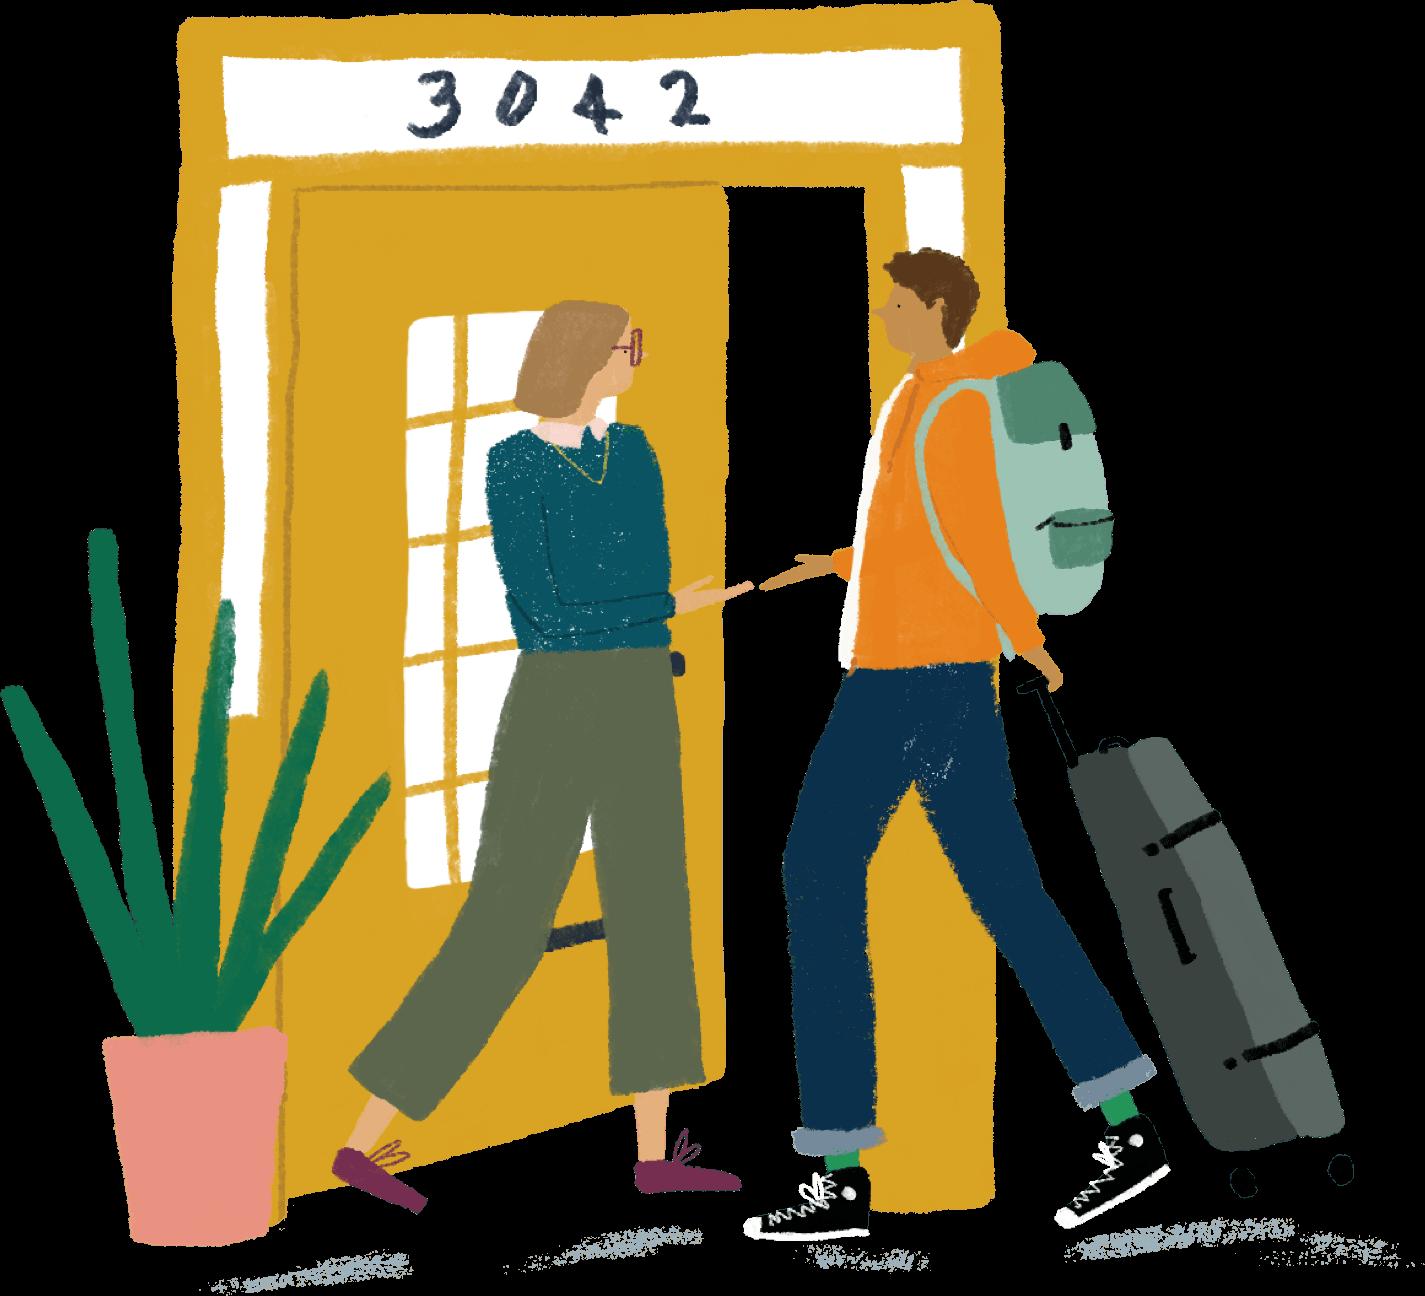 Host welcoming new tenant illustration